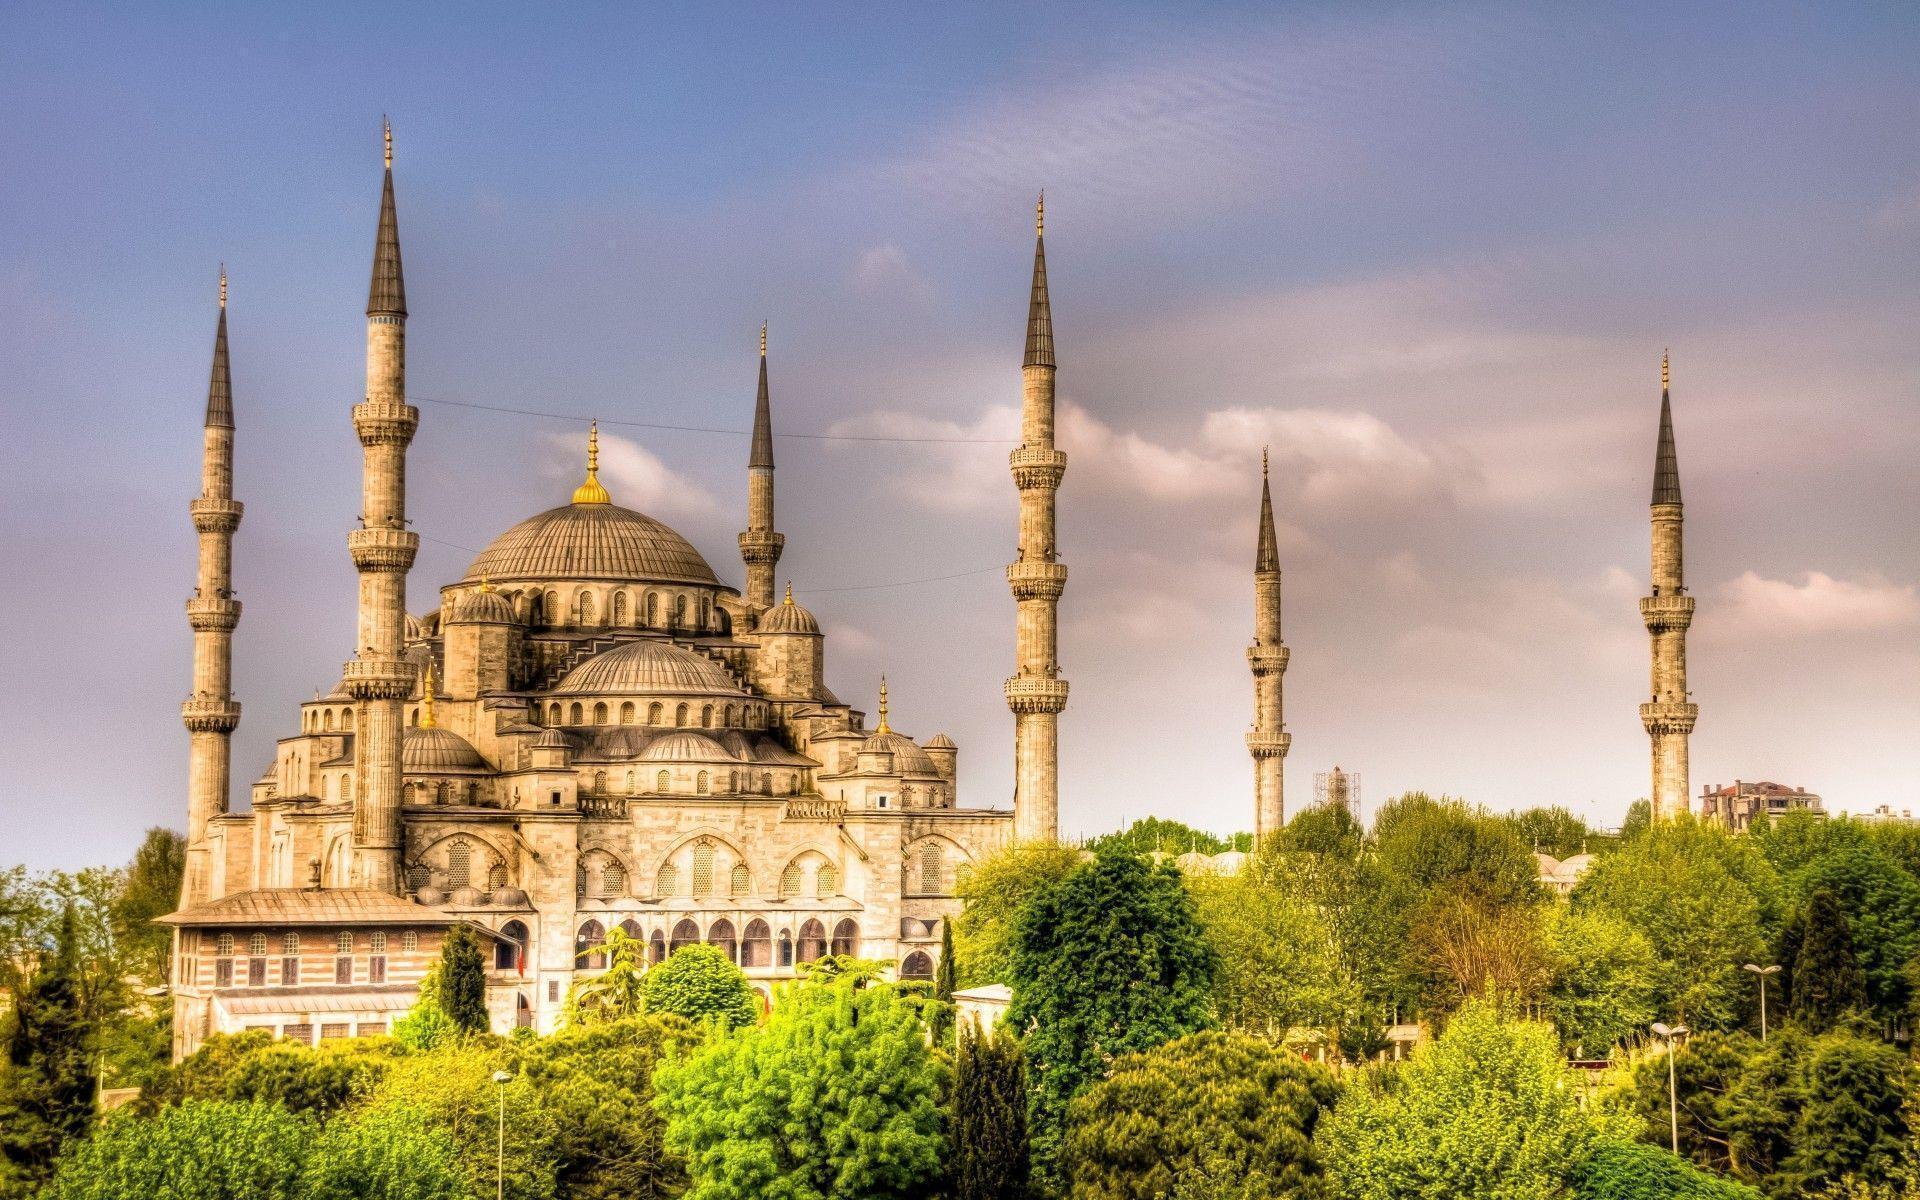 Beautiful Mosque Wallpaper HD Free Download For Desktop